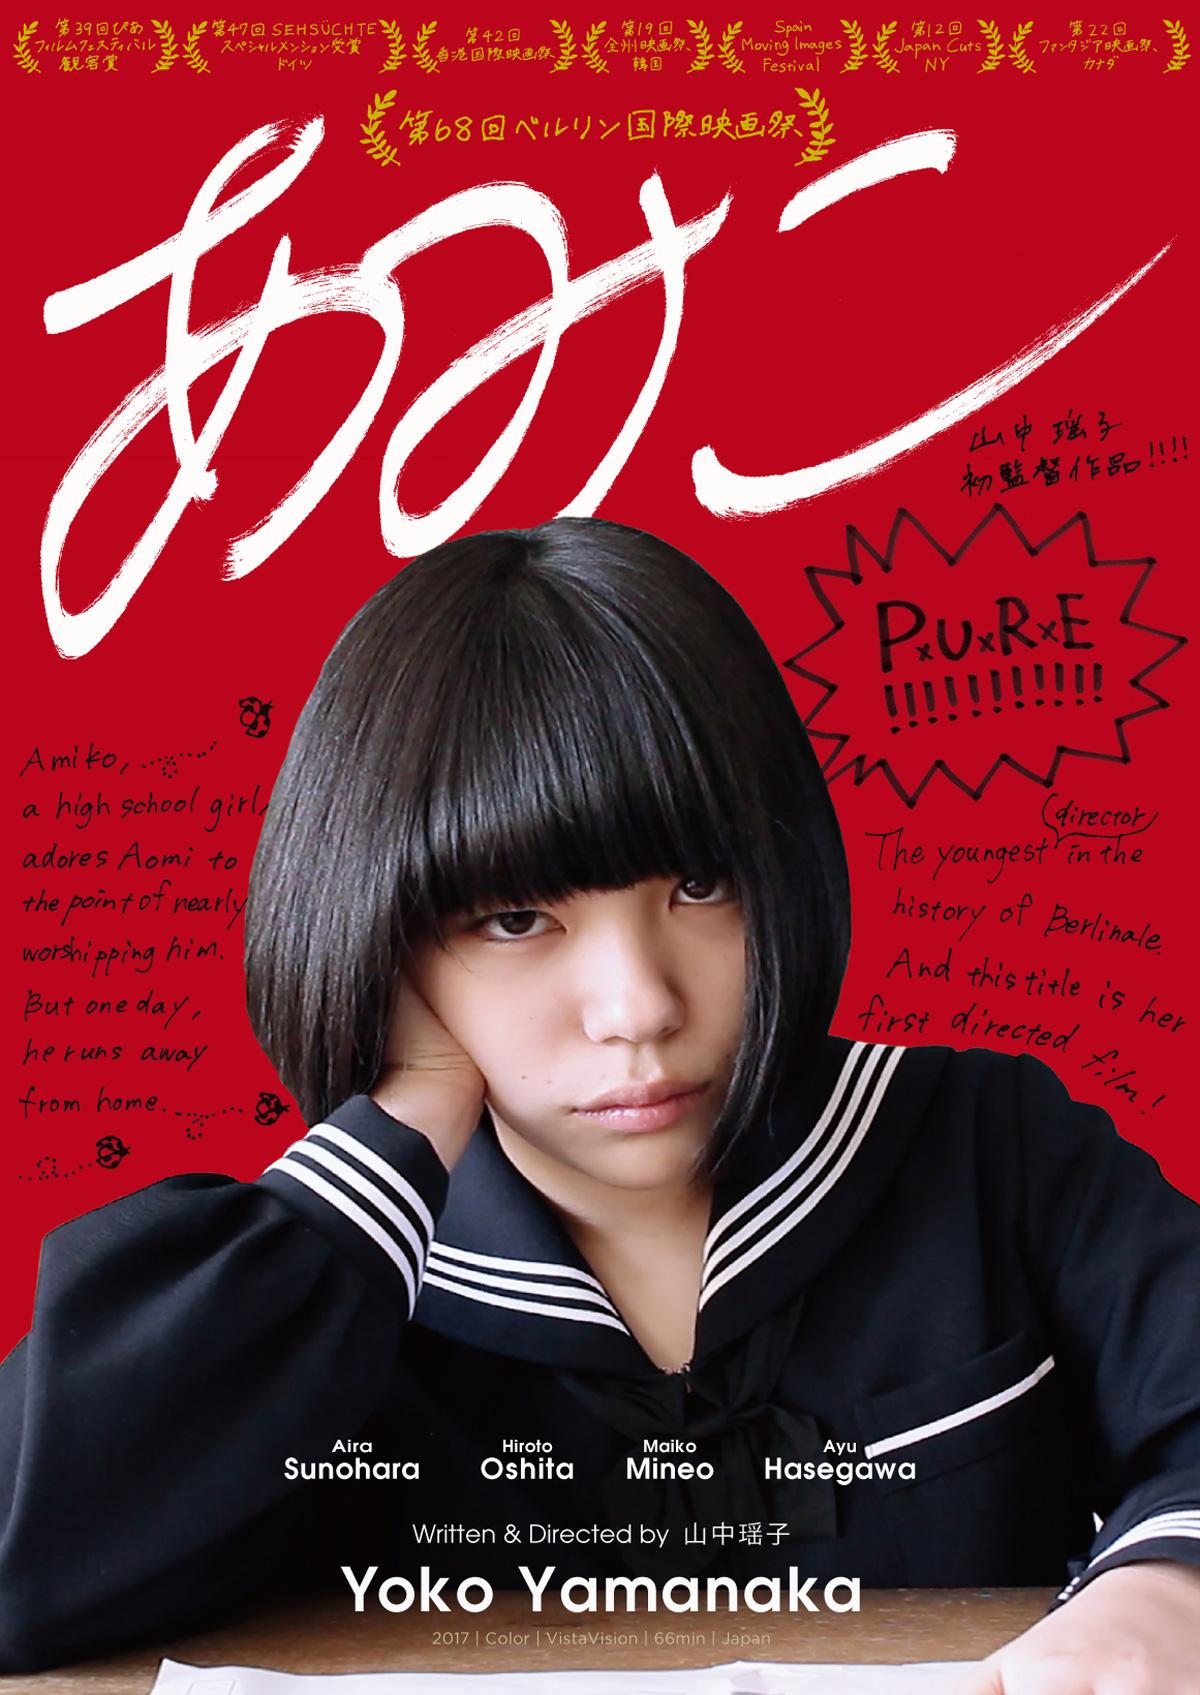 Amiko_poster.jpg